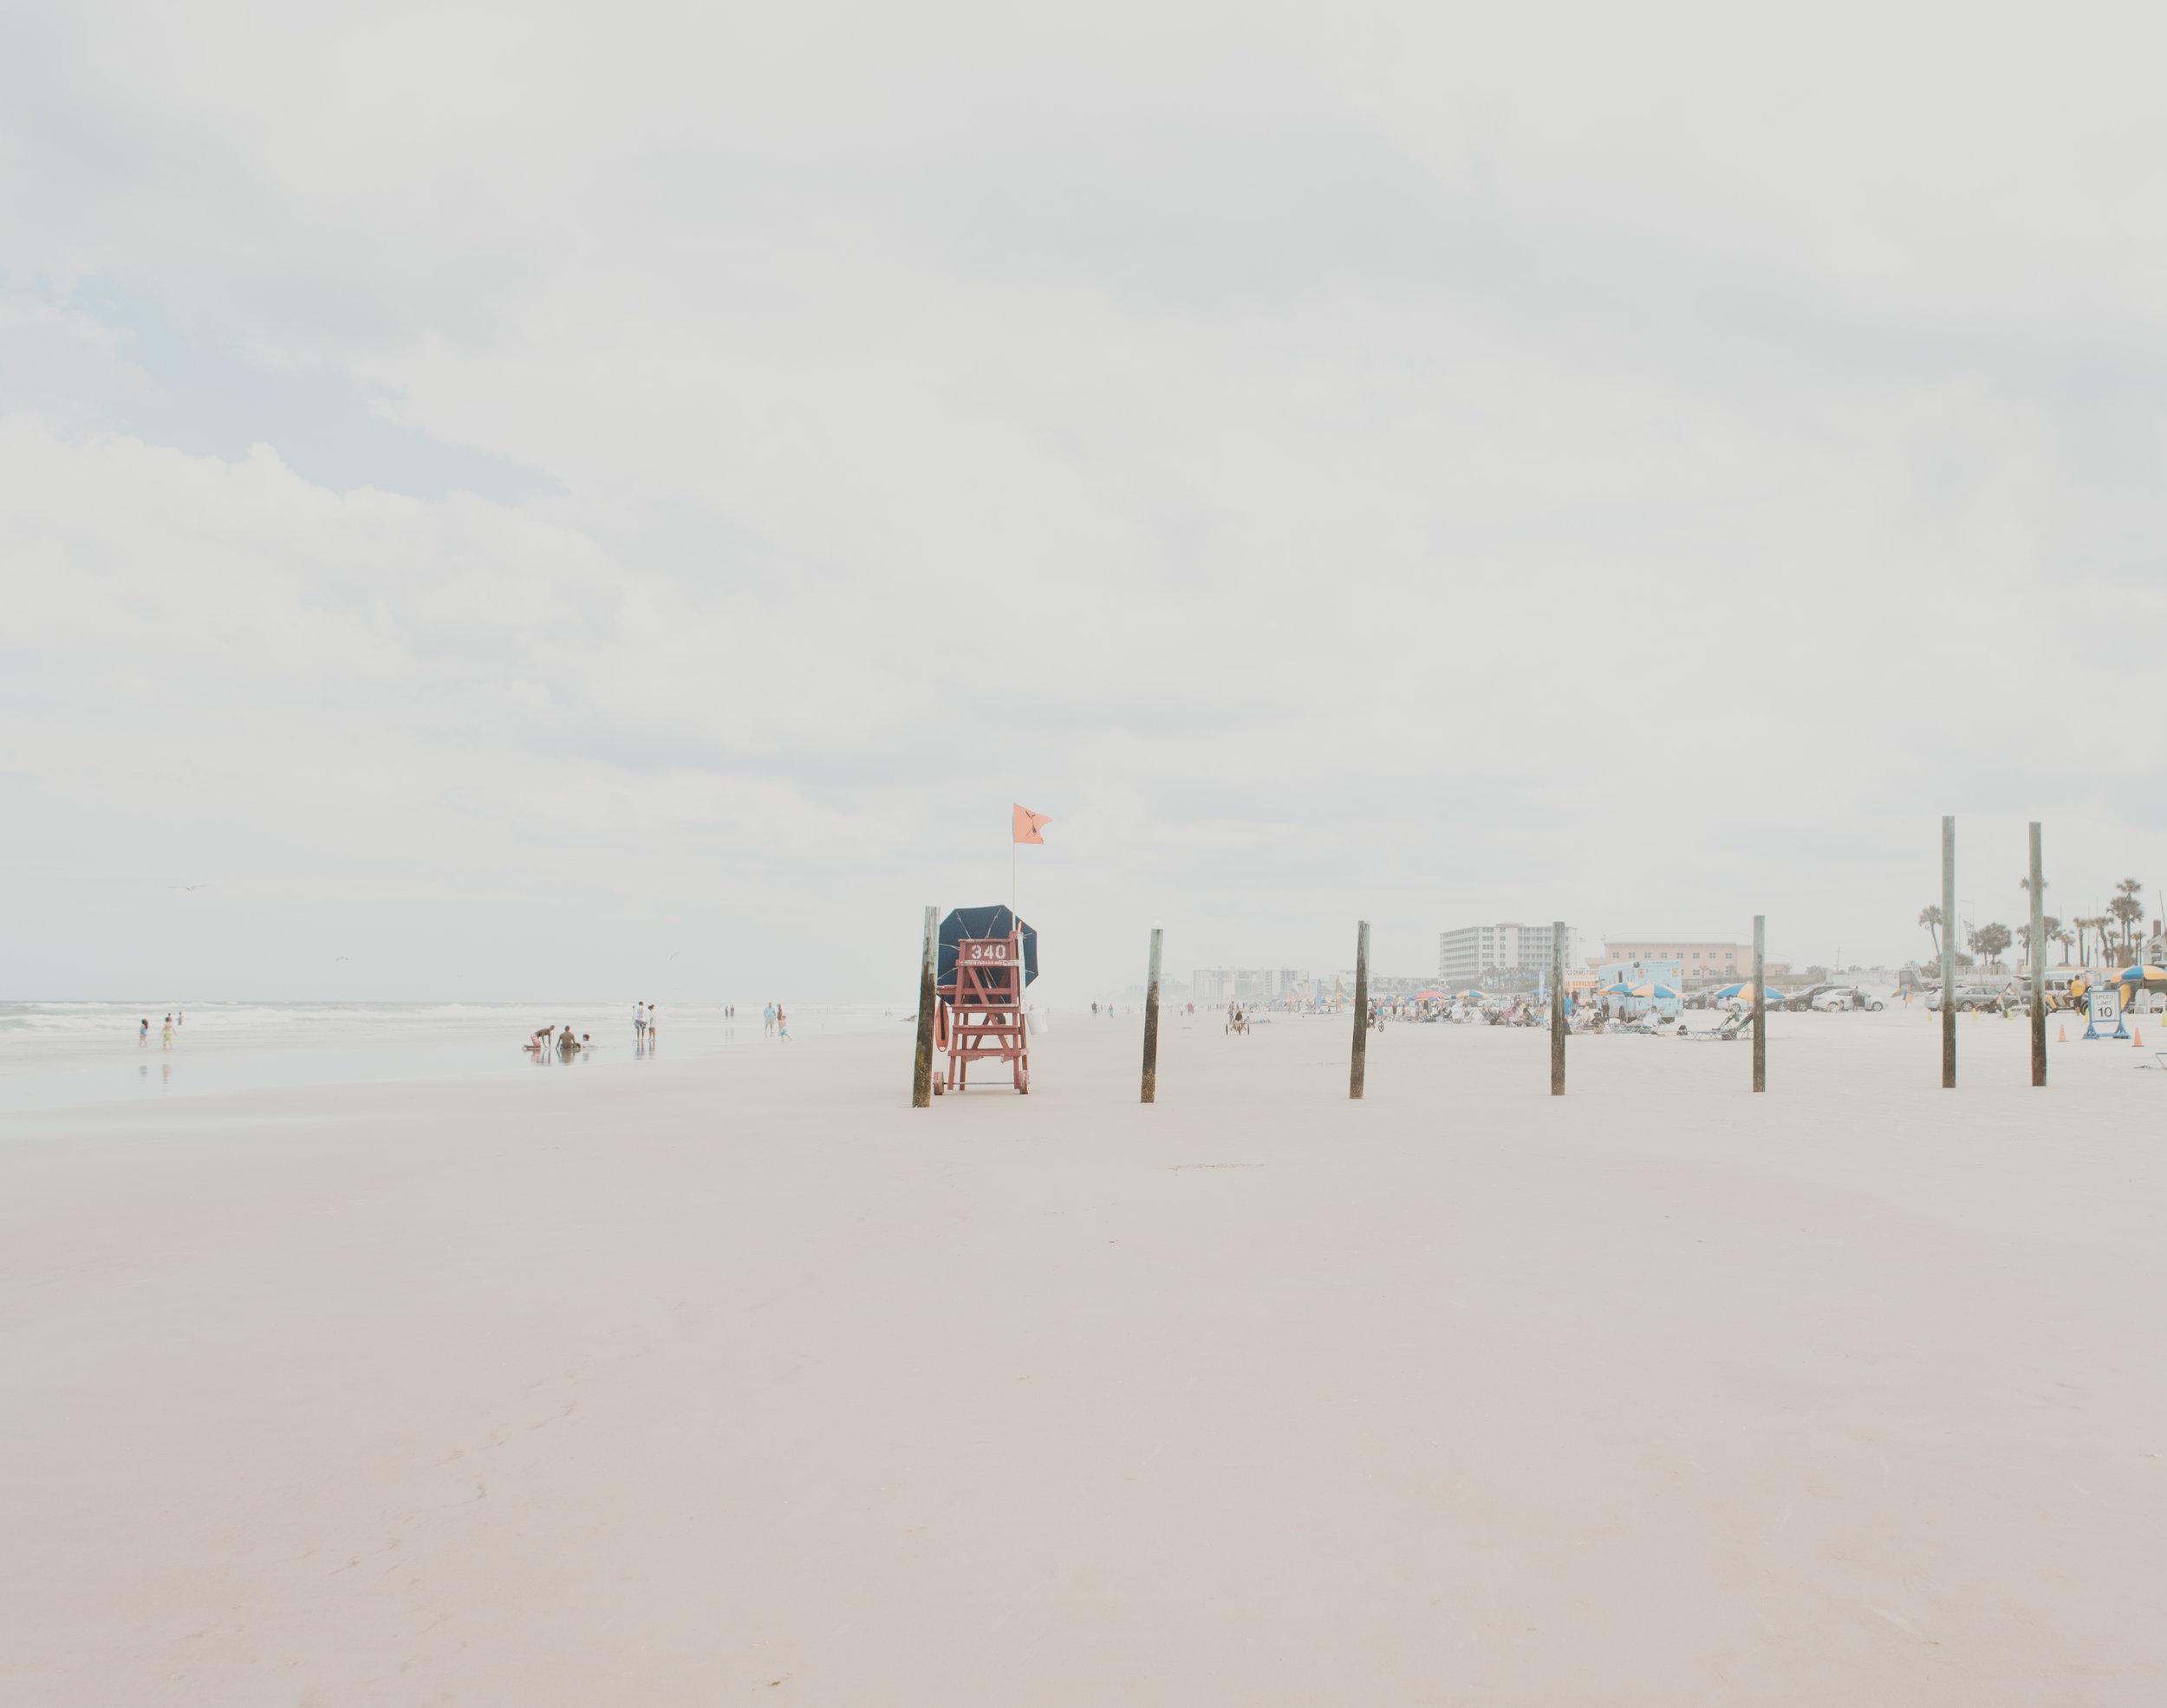 Daytona - Florida